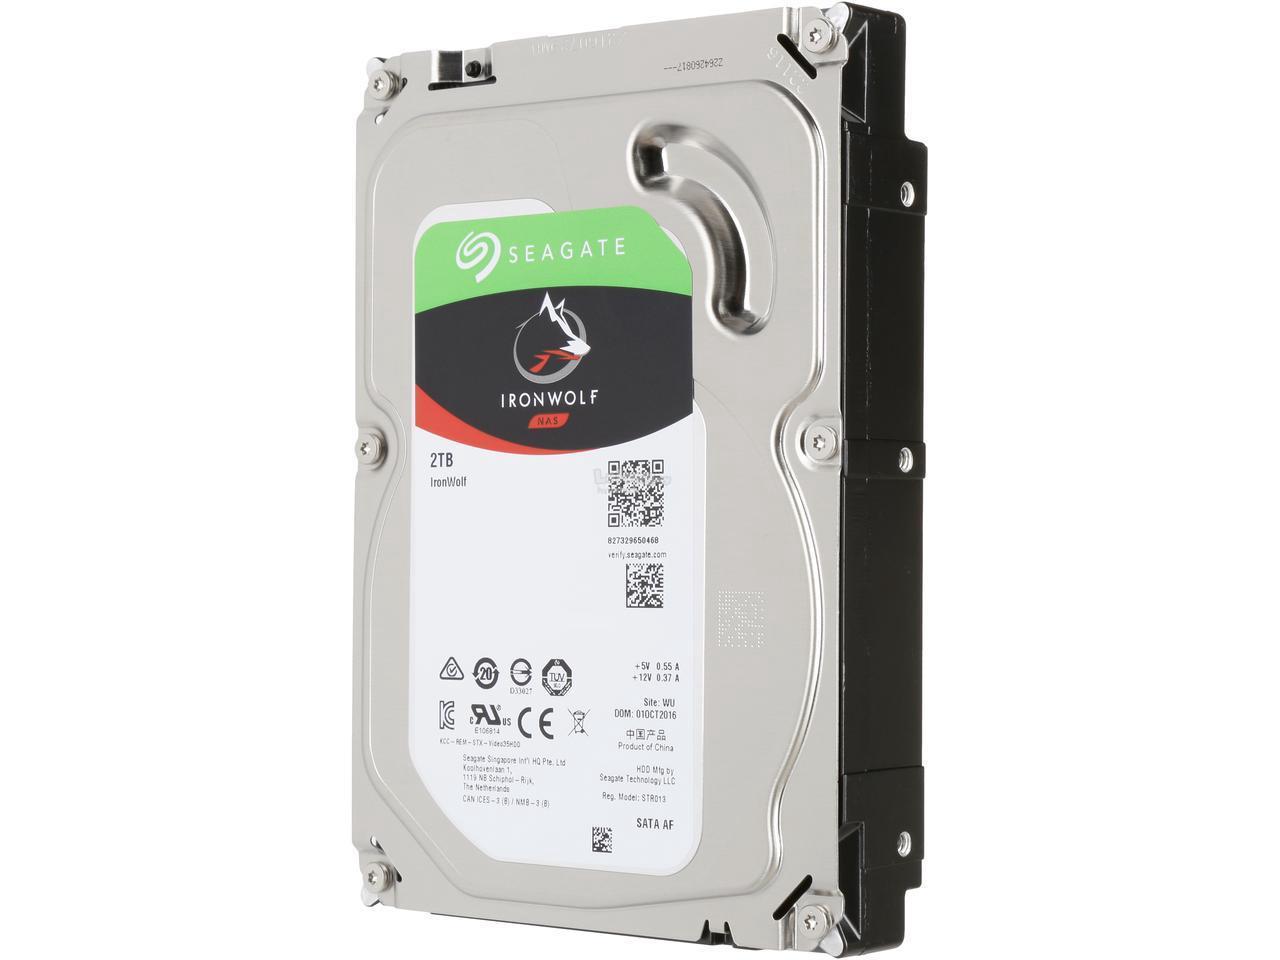 Seagate 2TB Internal IronWolf SATA 3.5 HDD